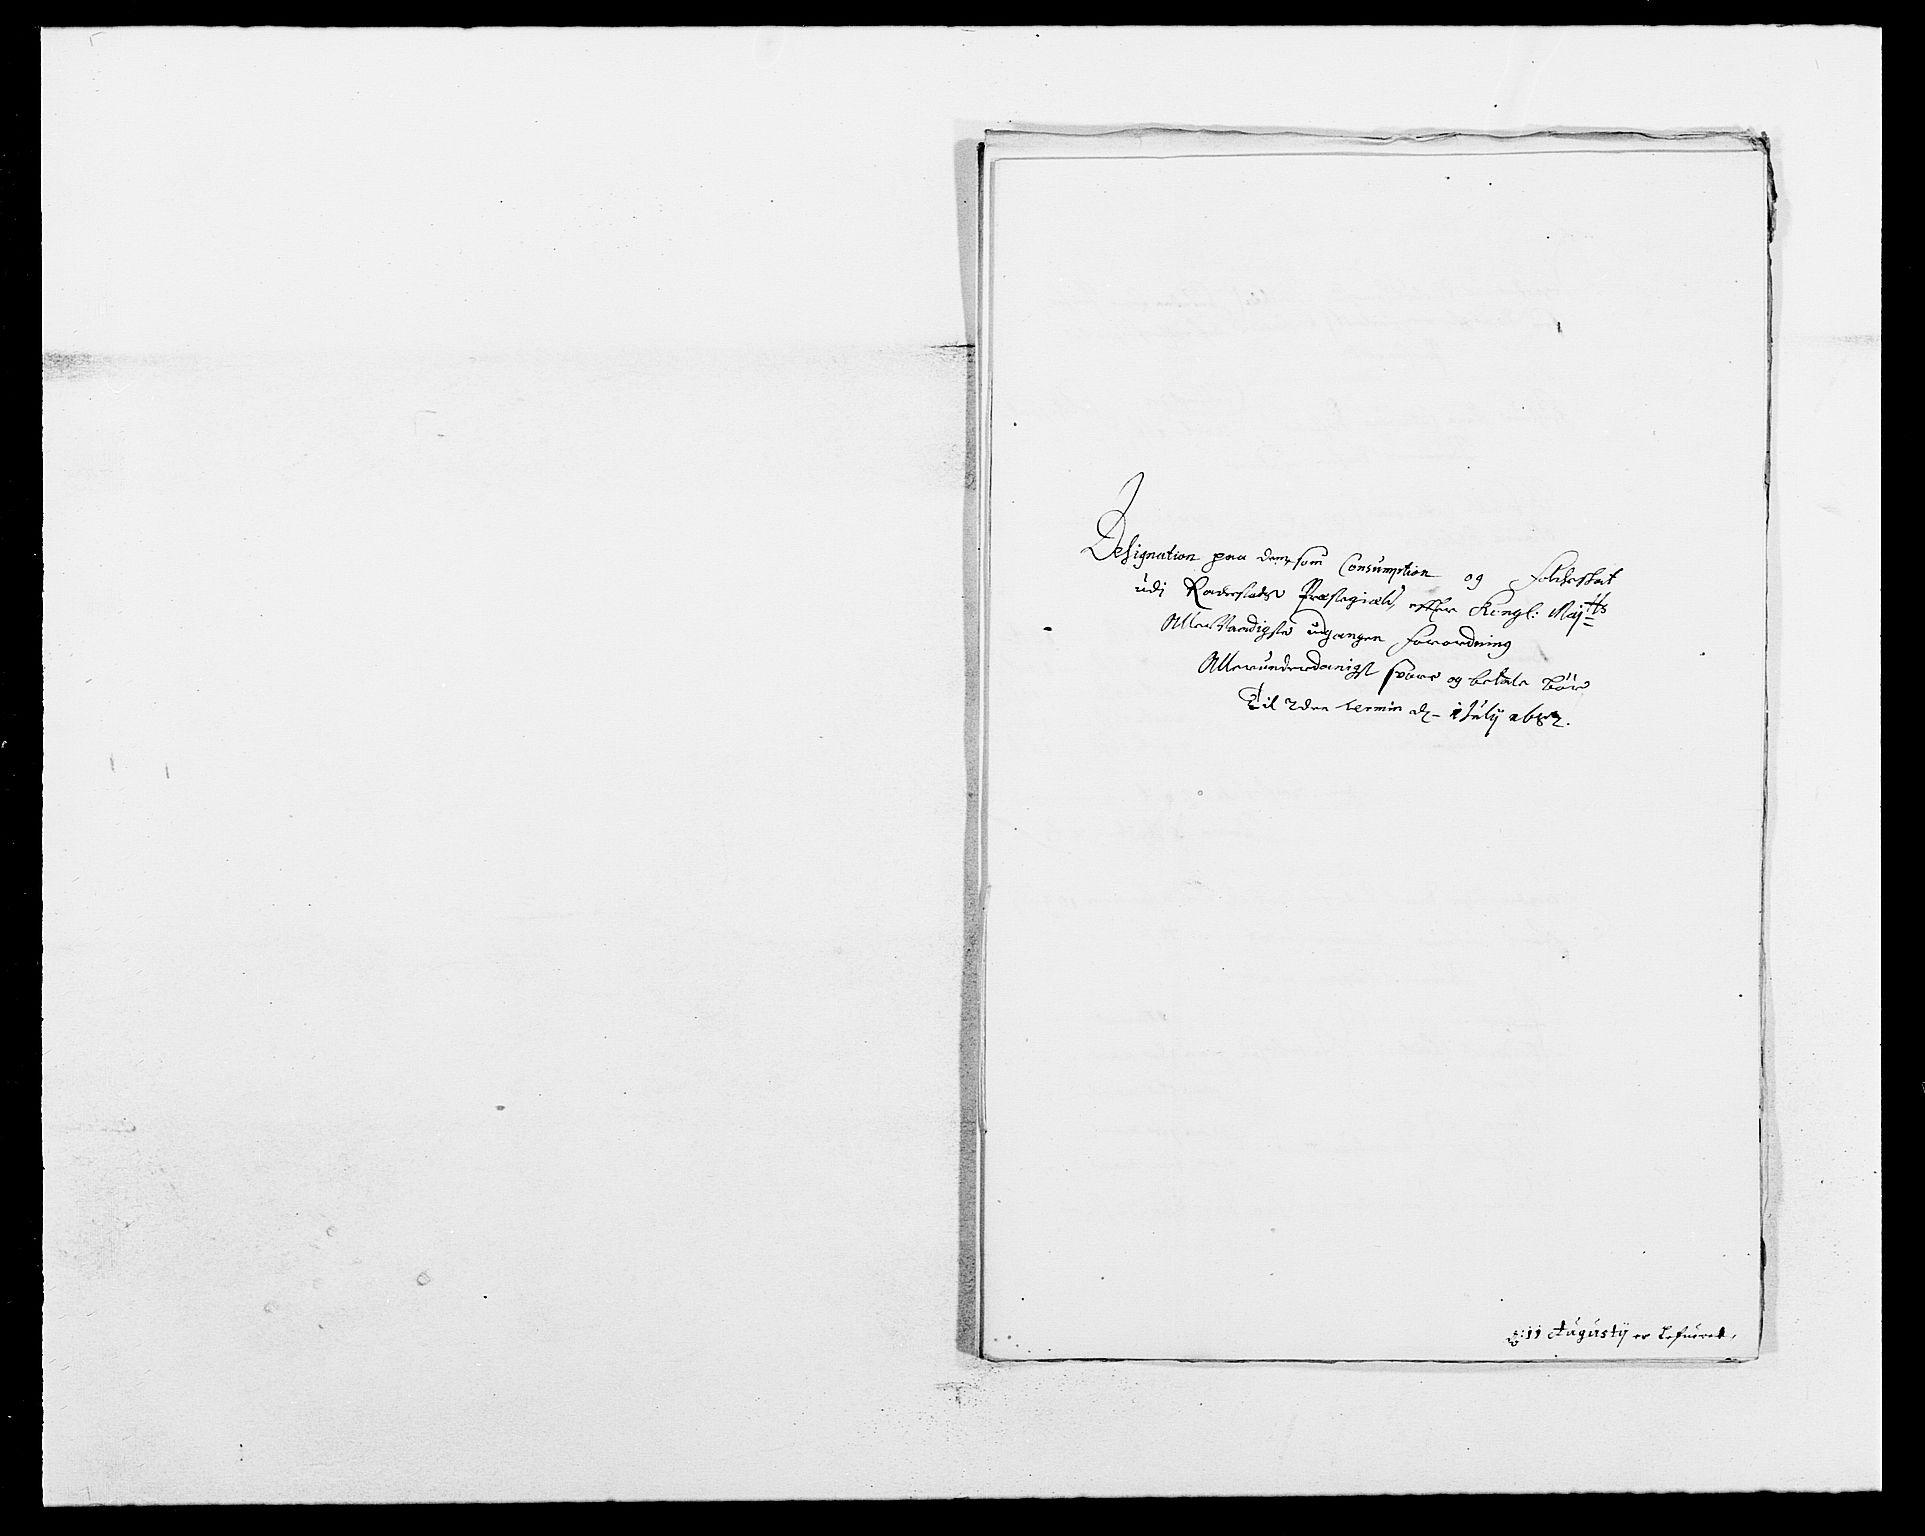 RA, Rentekammeret inntil 1814, Reviderte regnskaper, Fogderegnskap, R05/L0273: Fogderegnskap Rakkestad, 1682, s. 167